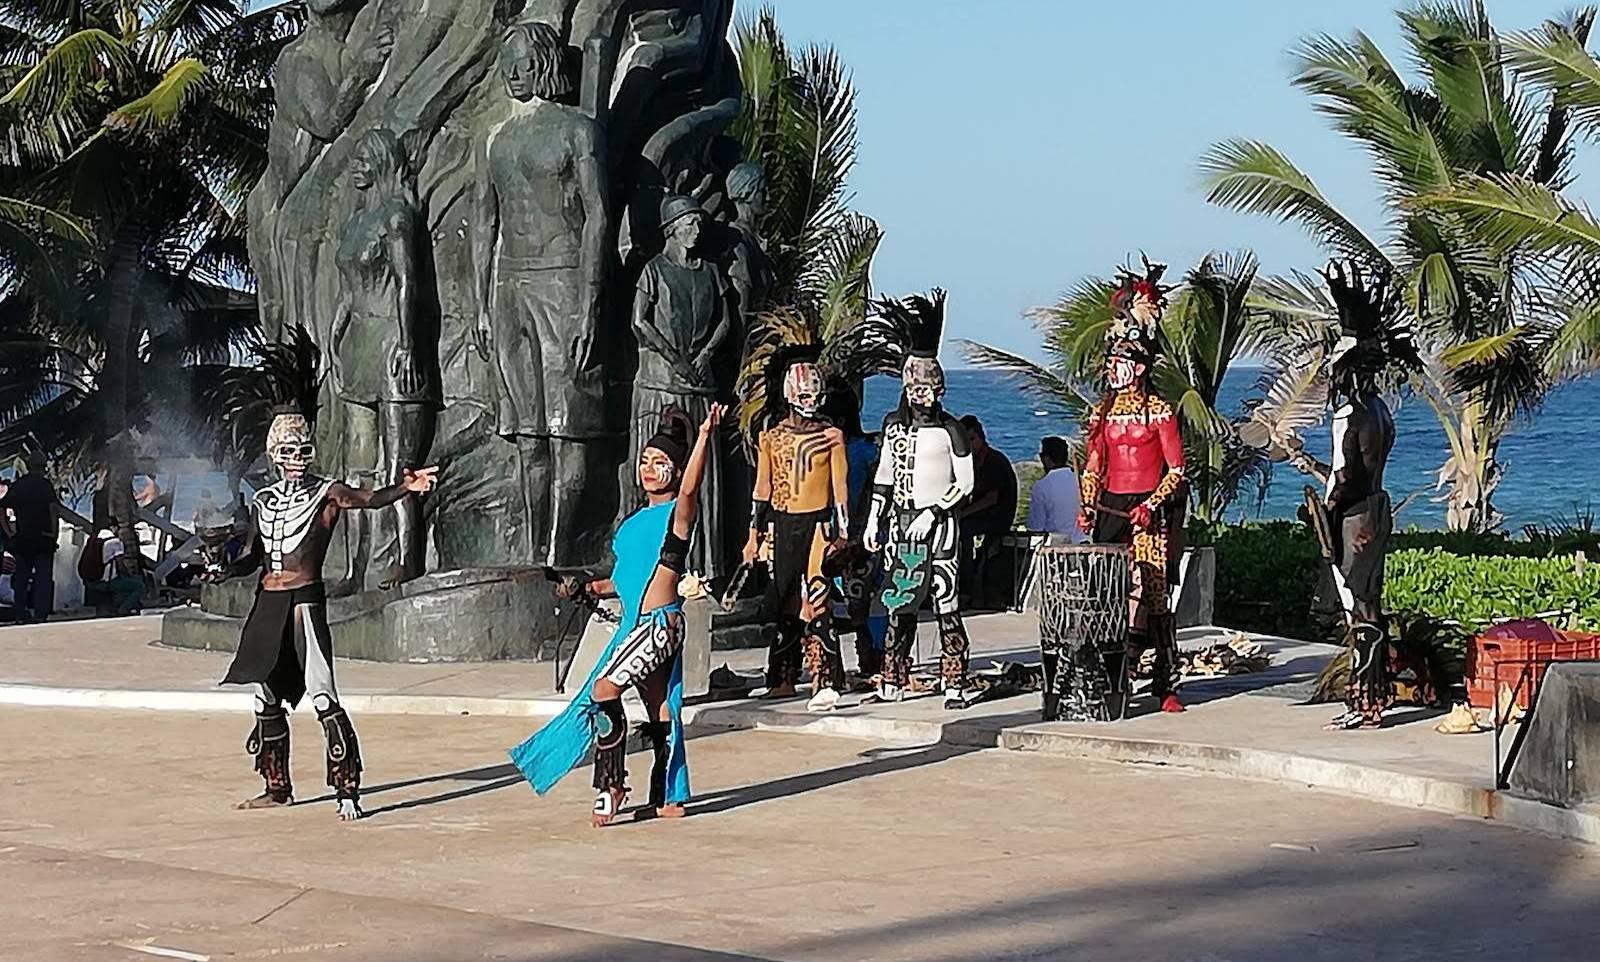 Een dagje Cozumel en de regendans